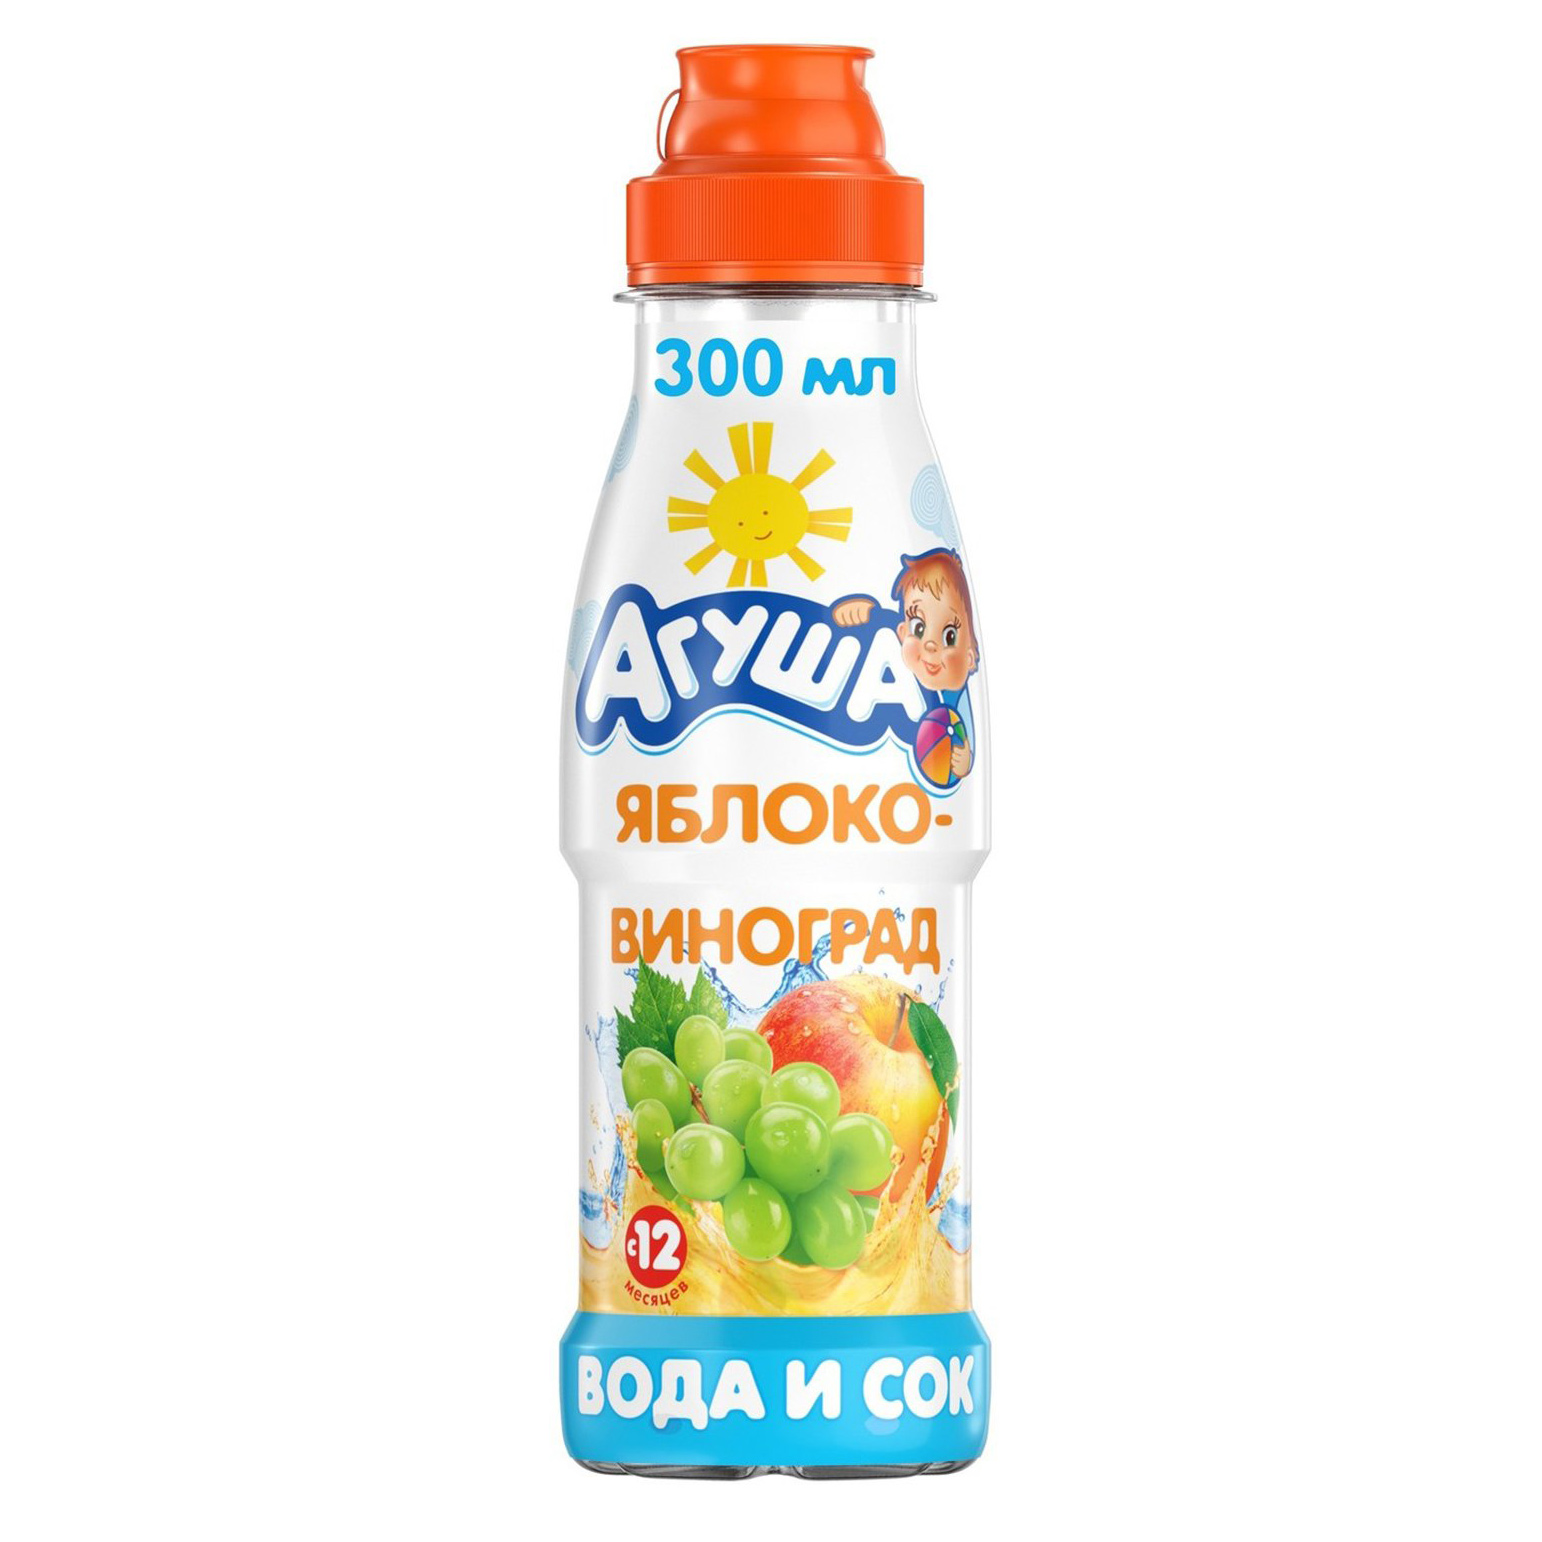 Вода с соком Агуша яблоко-виноград с 12-ти месяцев 300 мл